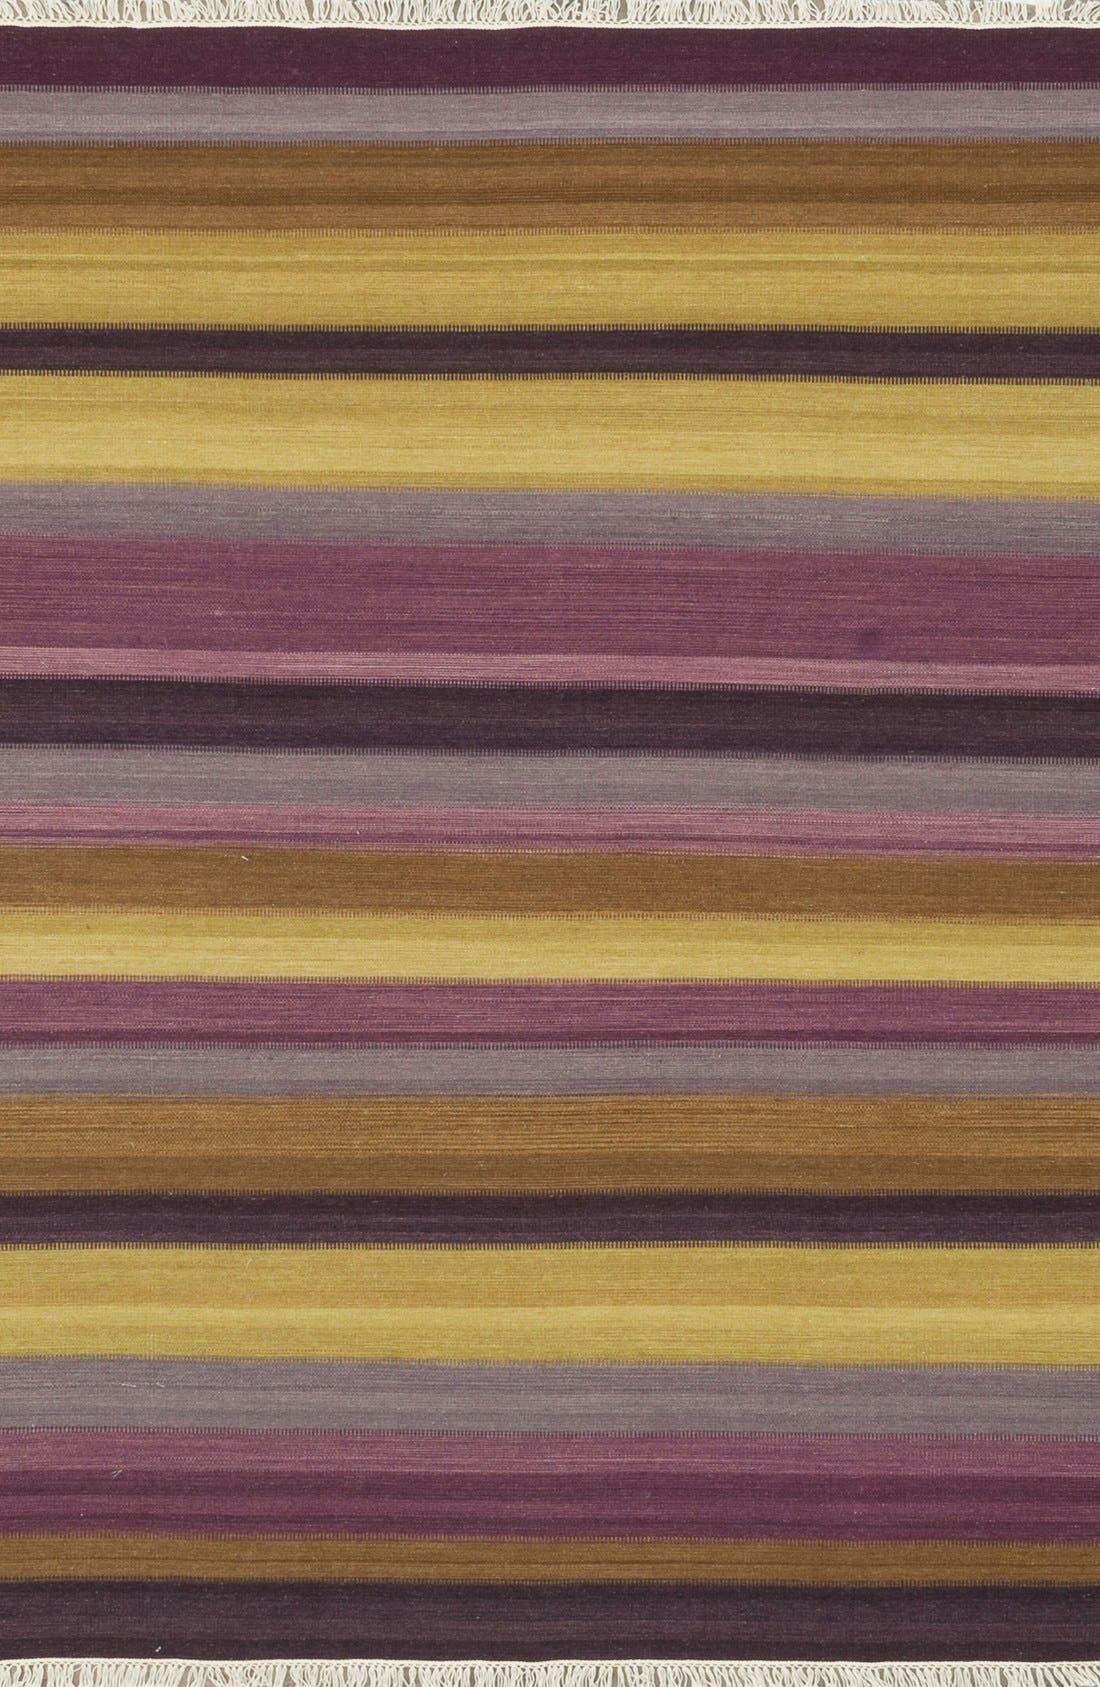 Alternate Image 1 Selected - Loloi 'Santana' Woven Wool Rug